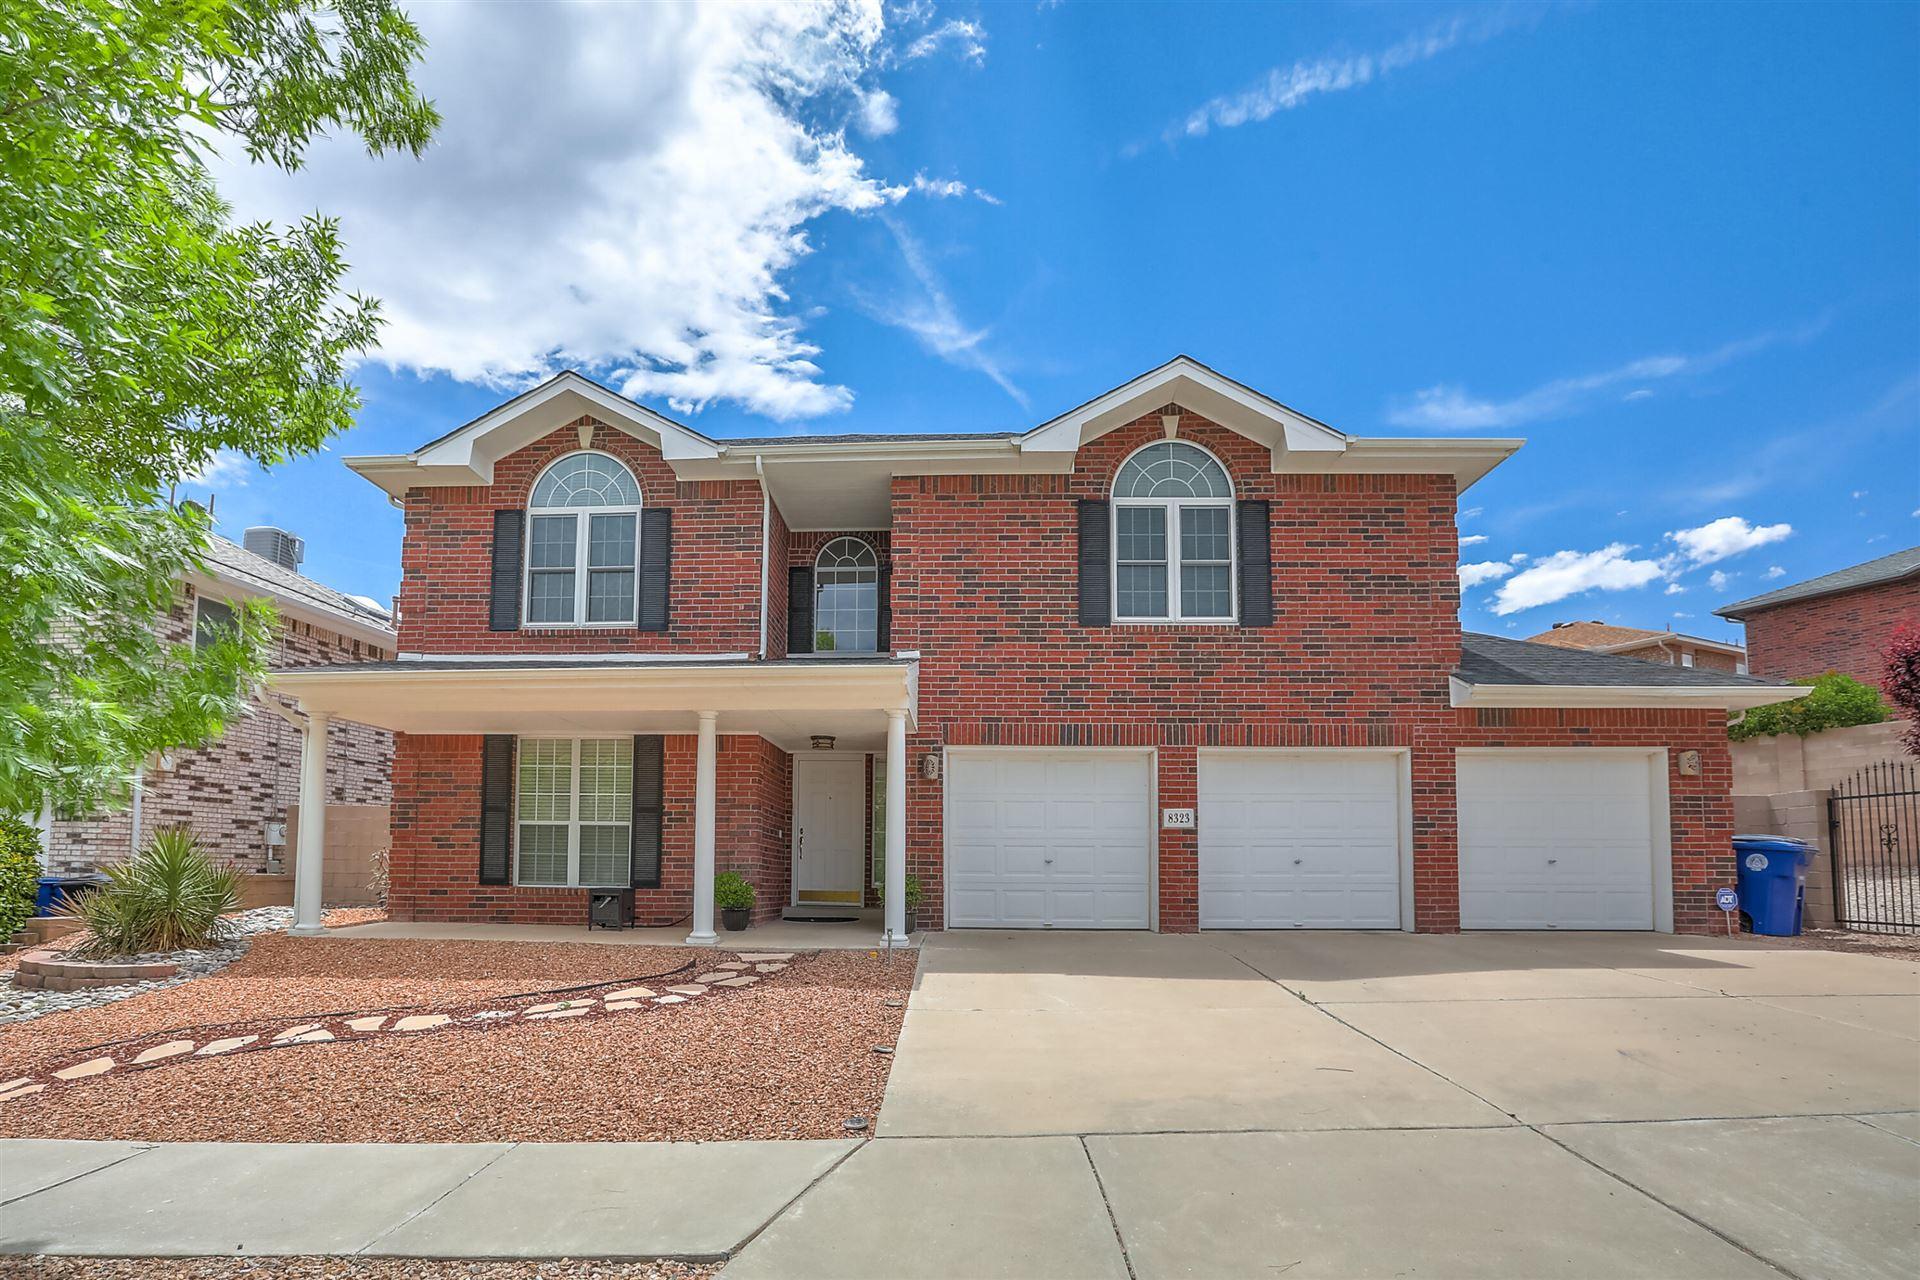 8323 CEDAR CREEK Drive NW, Albuquerque, NM 87120 - MLS#: 992795